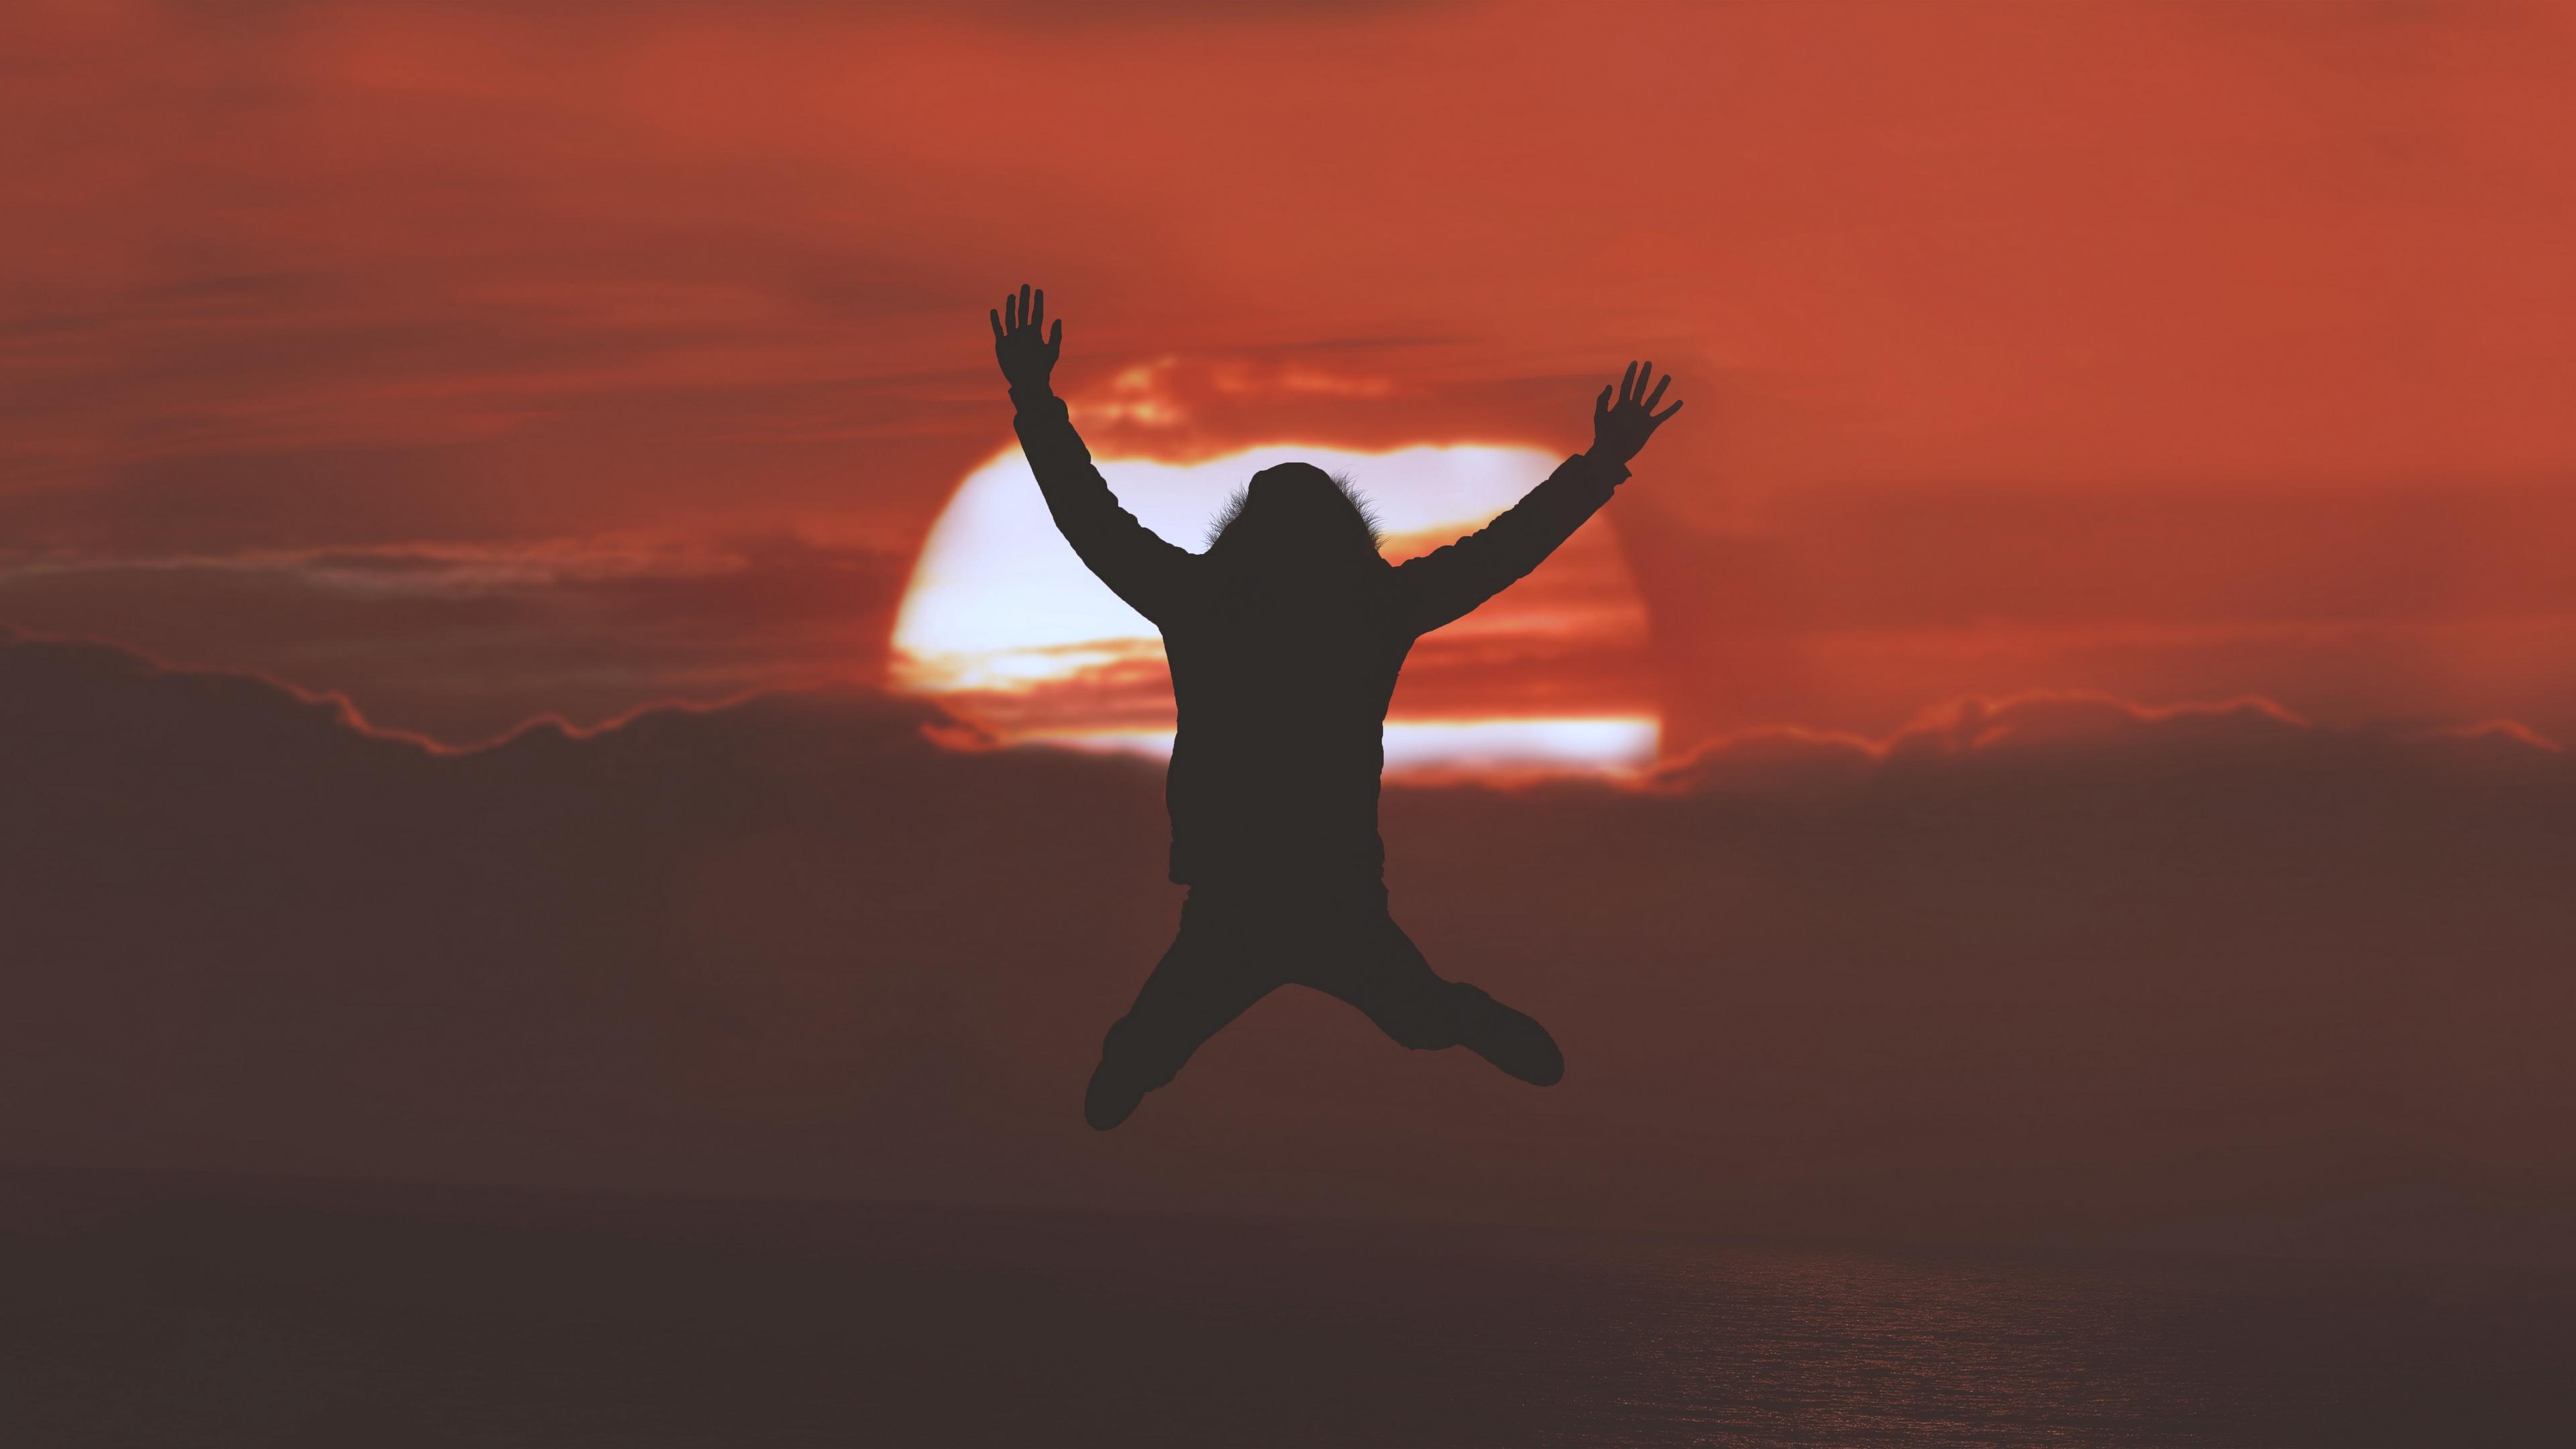 silhouette jump sunset horizon 4k 1536017753 - silhouette, jump, sunset, horizon 4k - sunset, Silhouette, jump